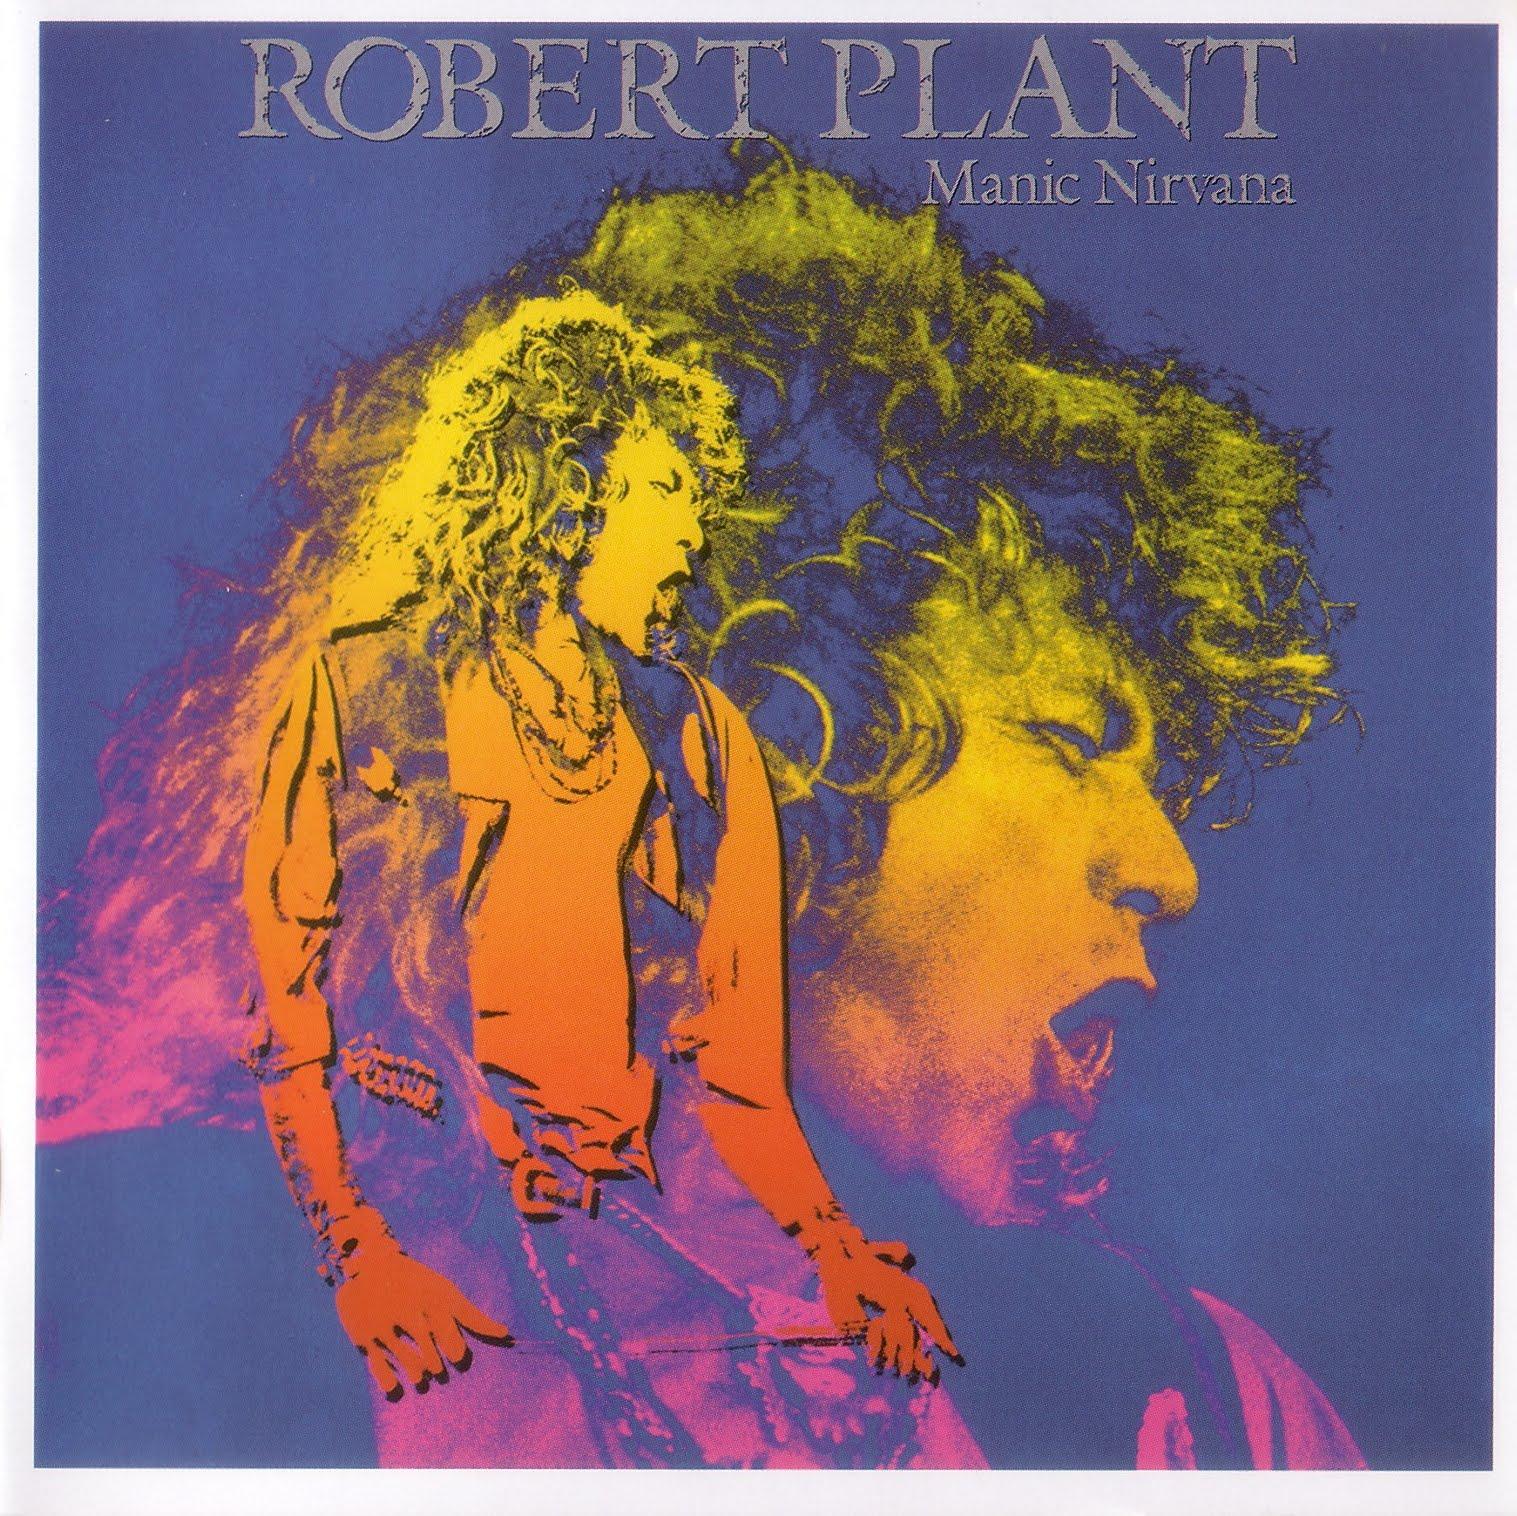 Happy 67th Birthday to Robert Plant Robert+Plant+-+Manic+Nirvana+-+Front